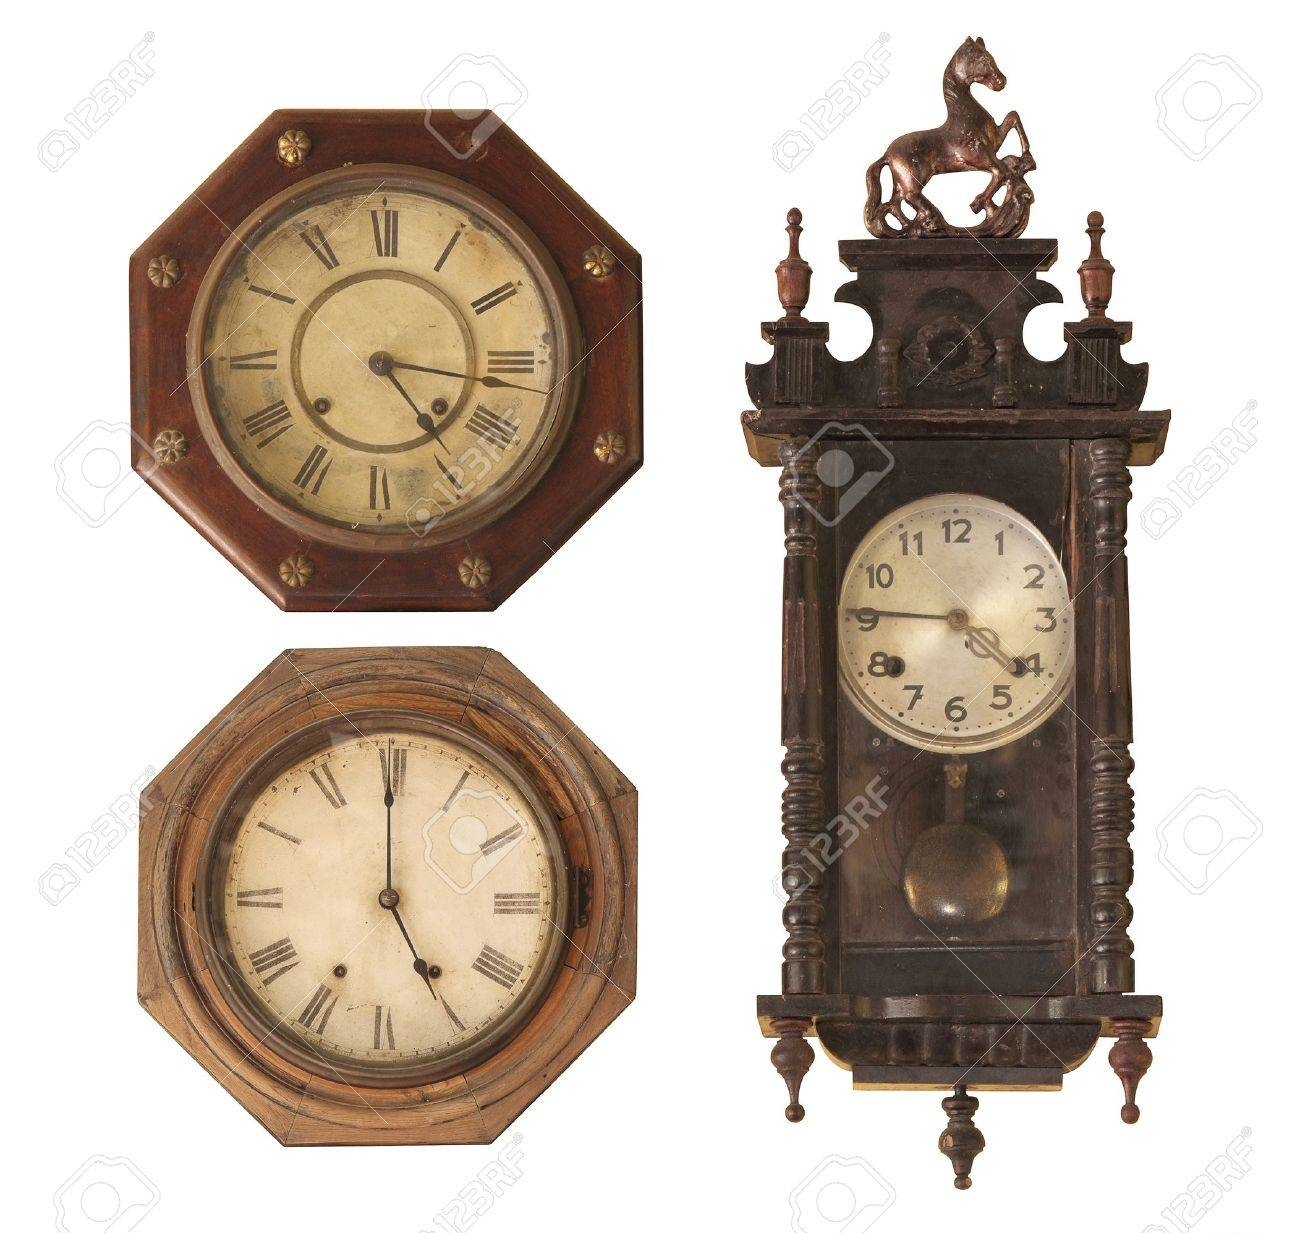 Vintage clock isolated on white. Stock Photo - 14589861